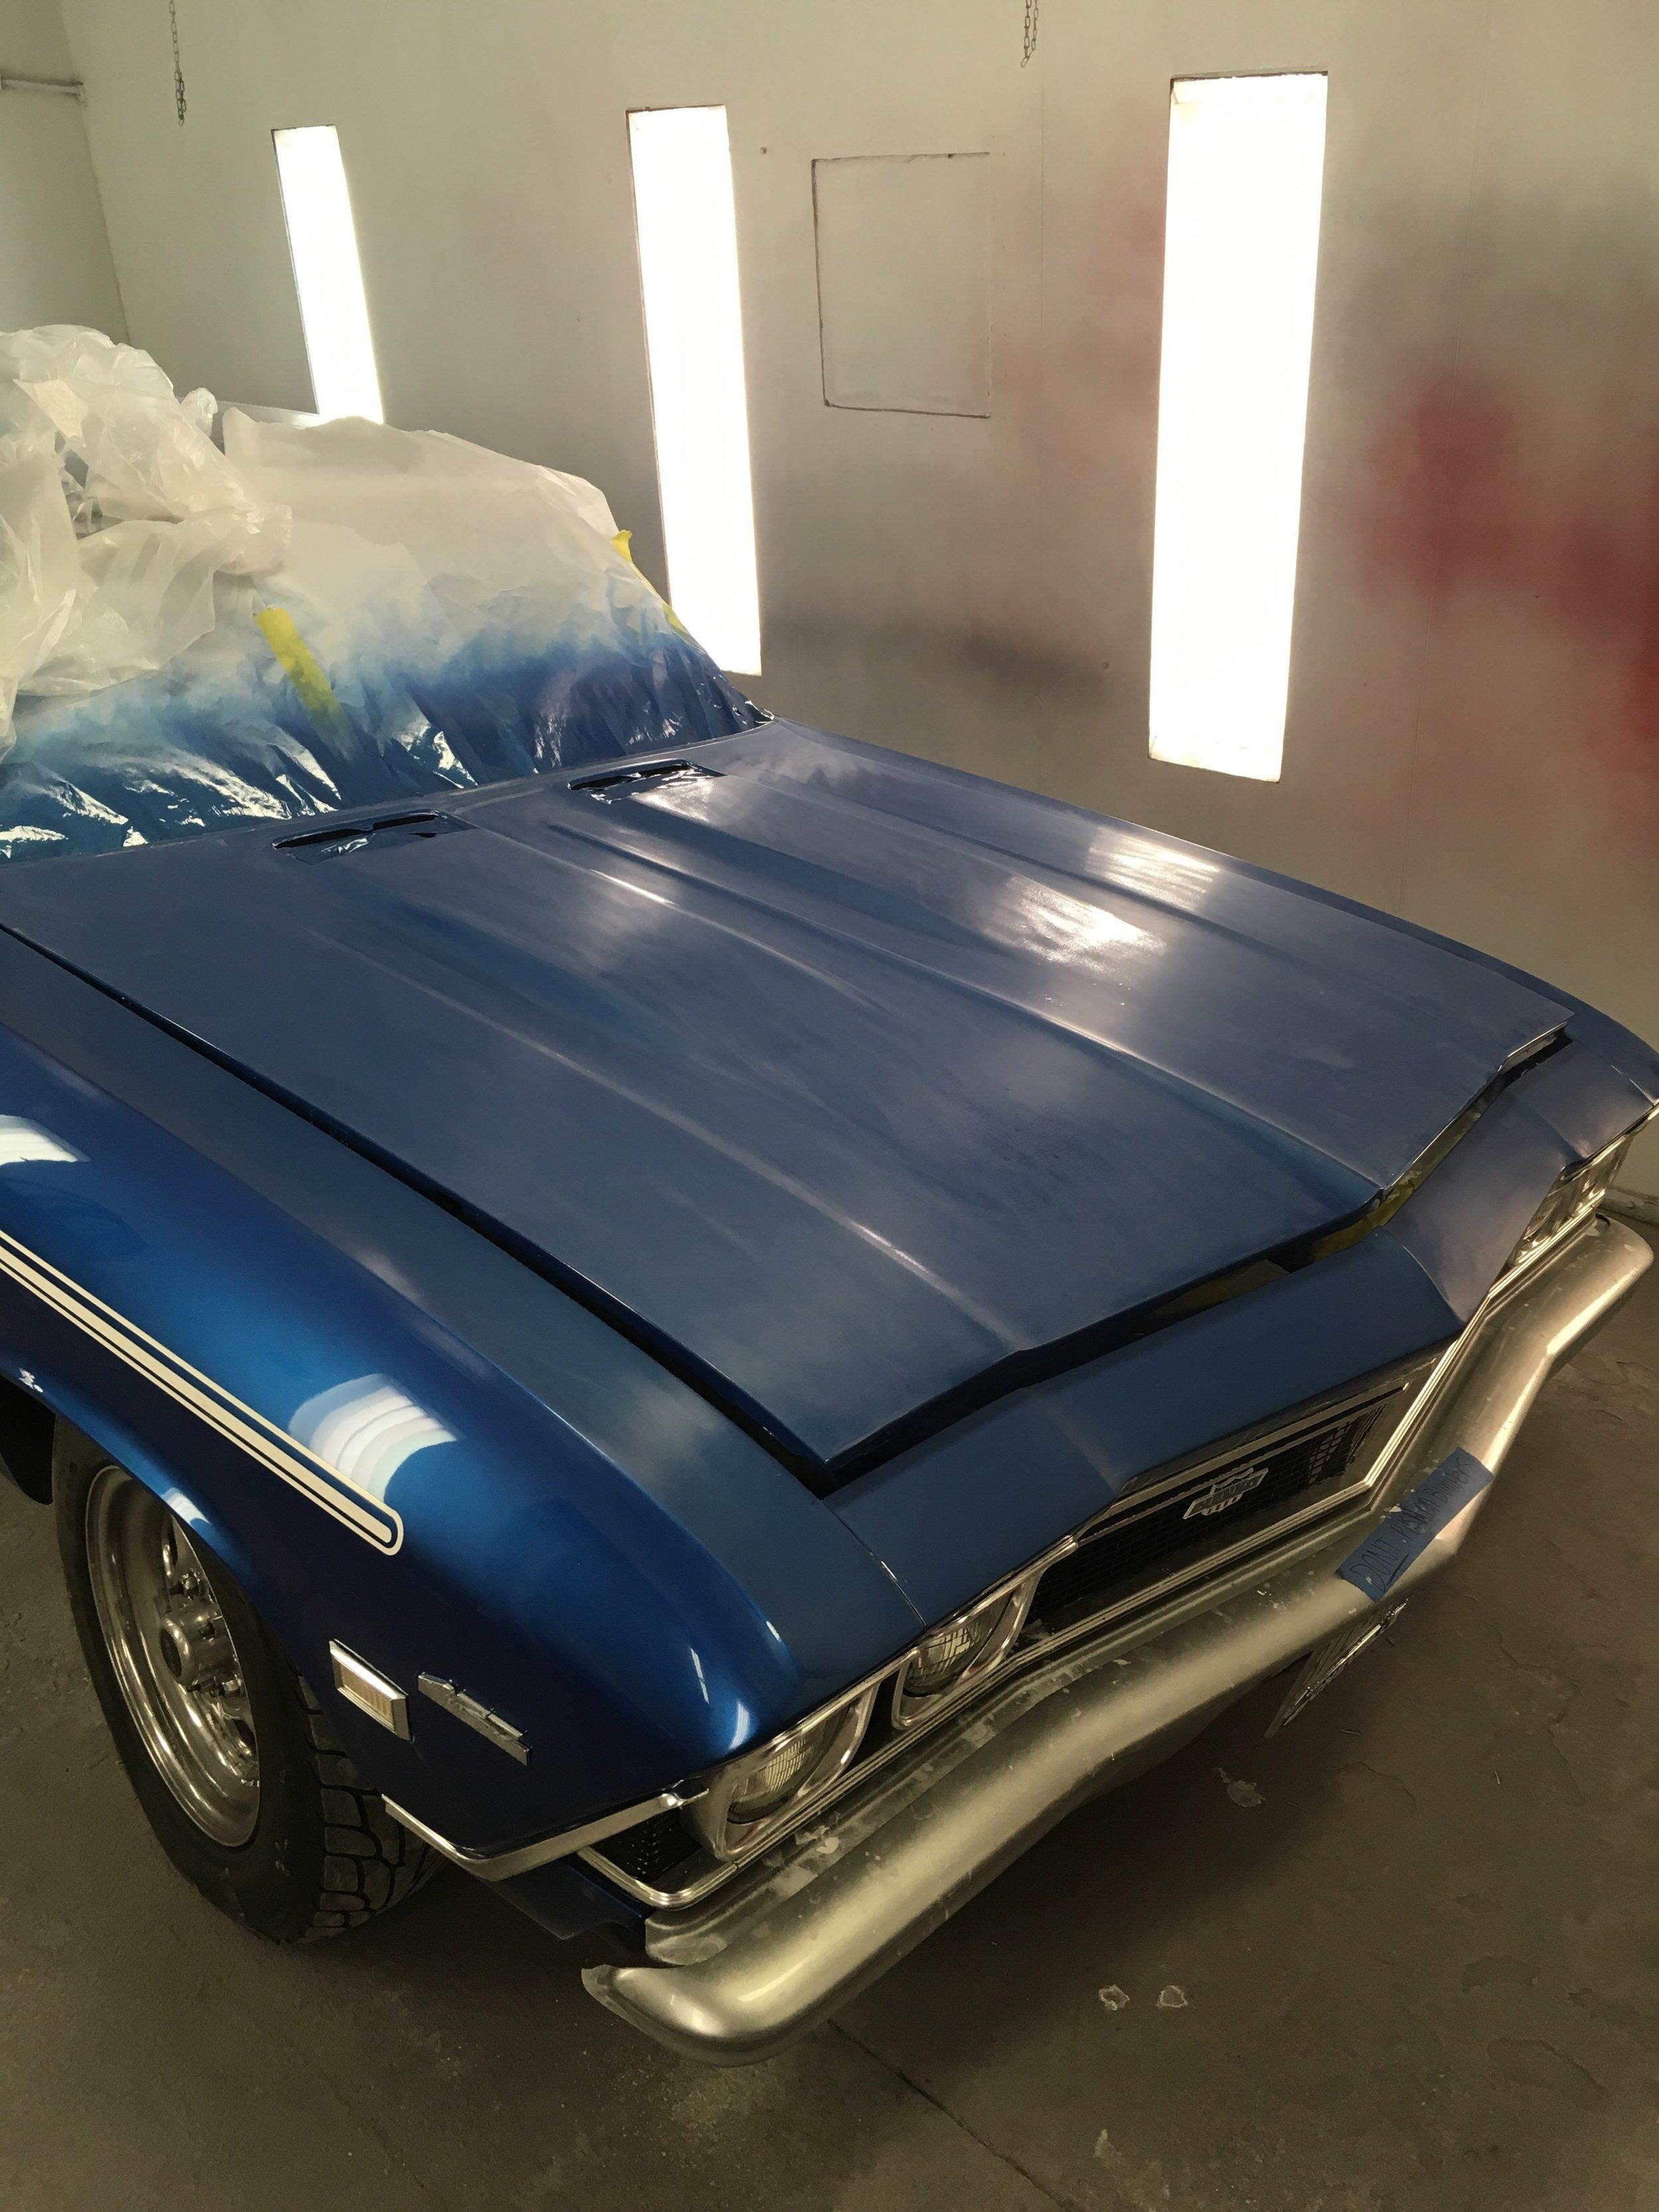 1968-chevelle-yenko-minneapolis-hot-rod-factory-car-restoration.jpg